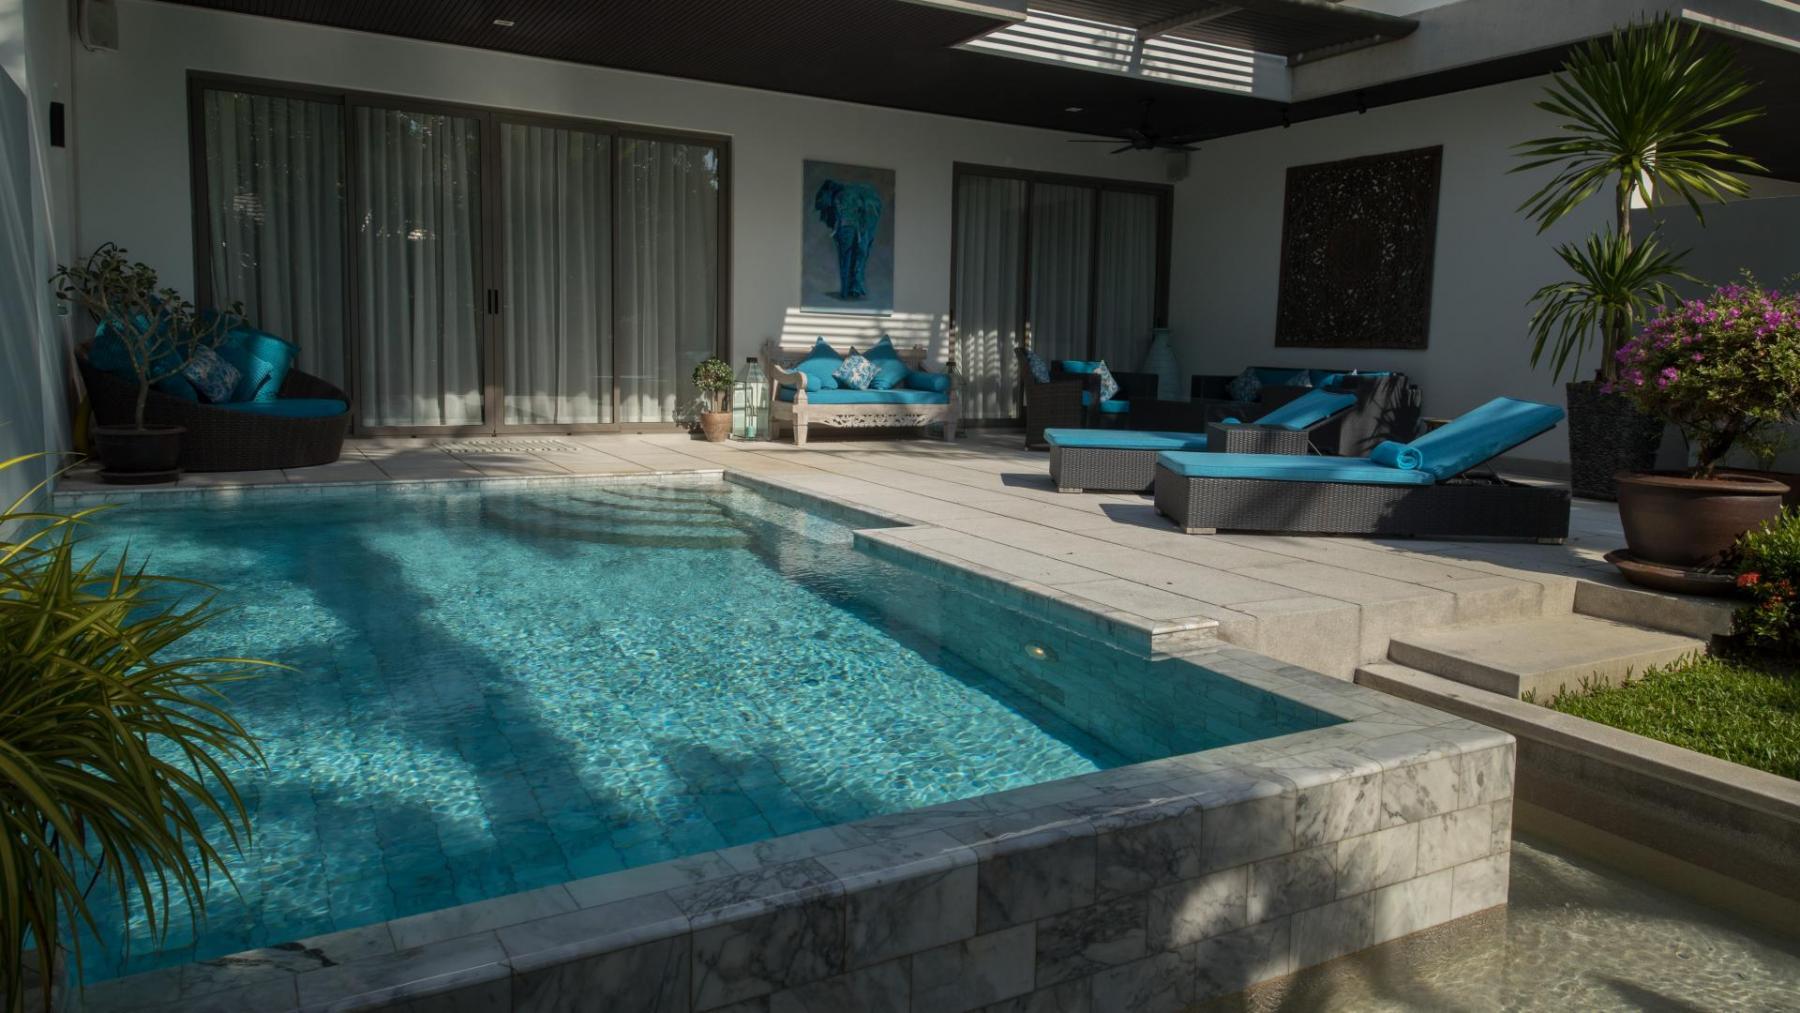 Luxury-Real-Estate-Properties-Phuket-Homes-For-Sale-Thailand-jpg-6